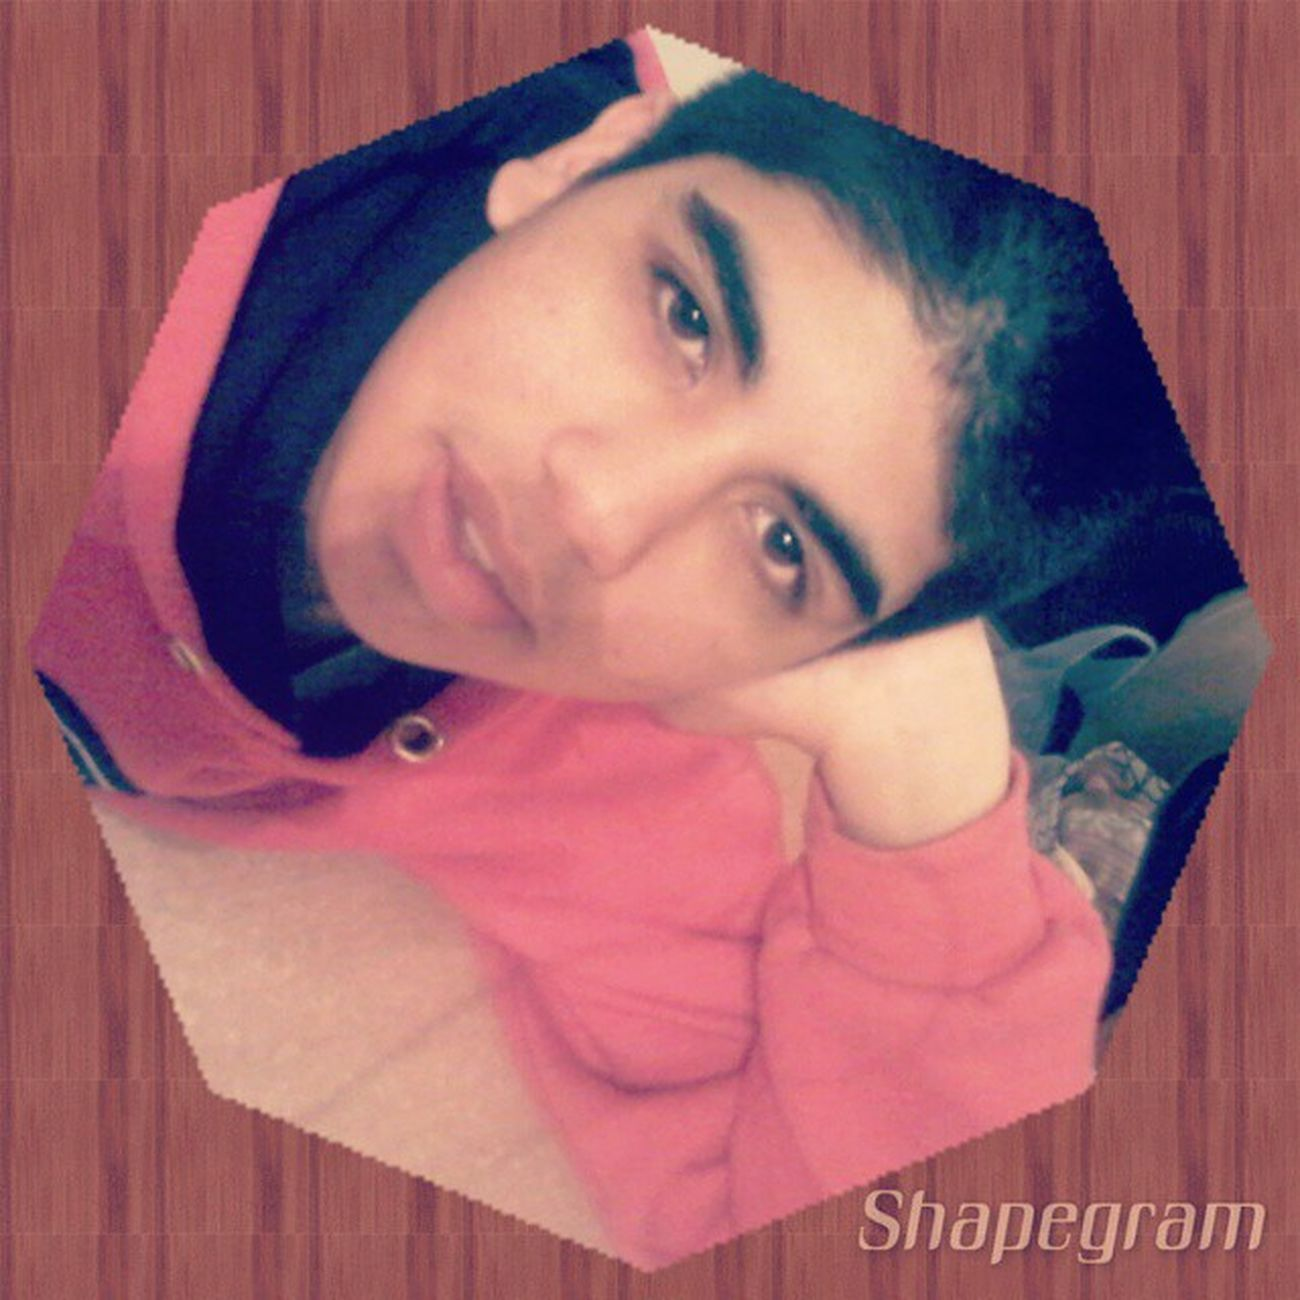 Shapegram Photo Pic Me fiaca sueño aburrido baah S2